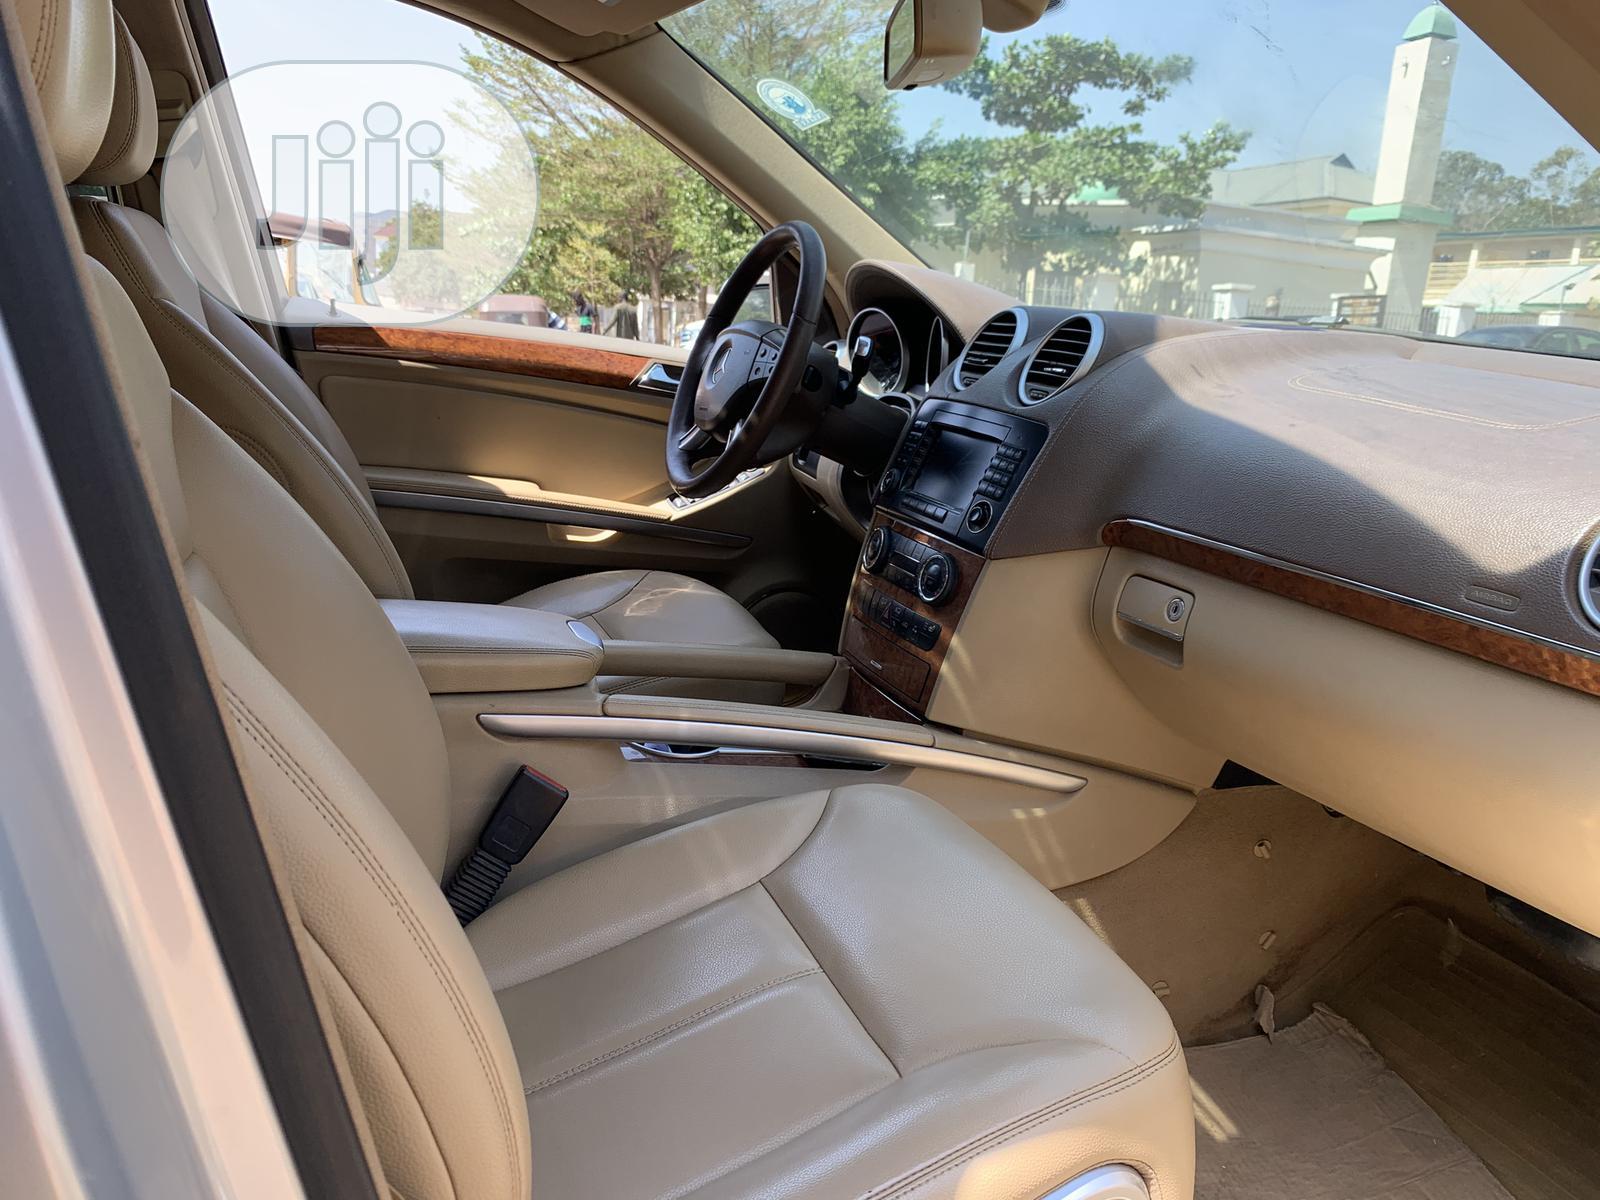 Mercedes-Benz GL Class 2007 GL 450 Silver   Cars for sale in Gwarinpa, Abuja (FCT) State, Nigeria